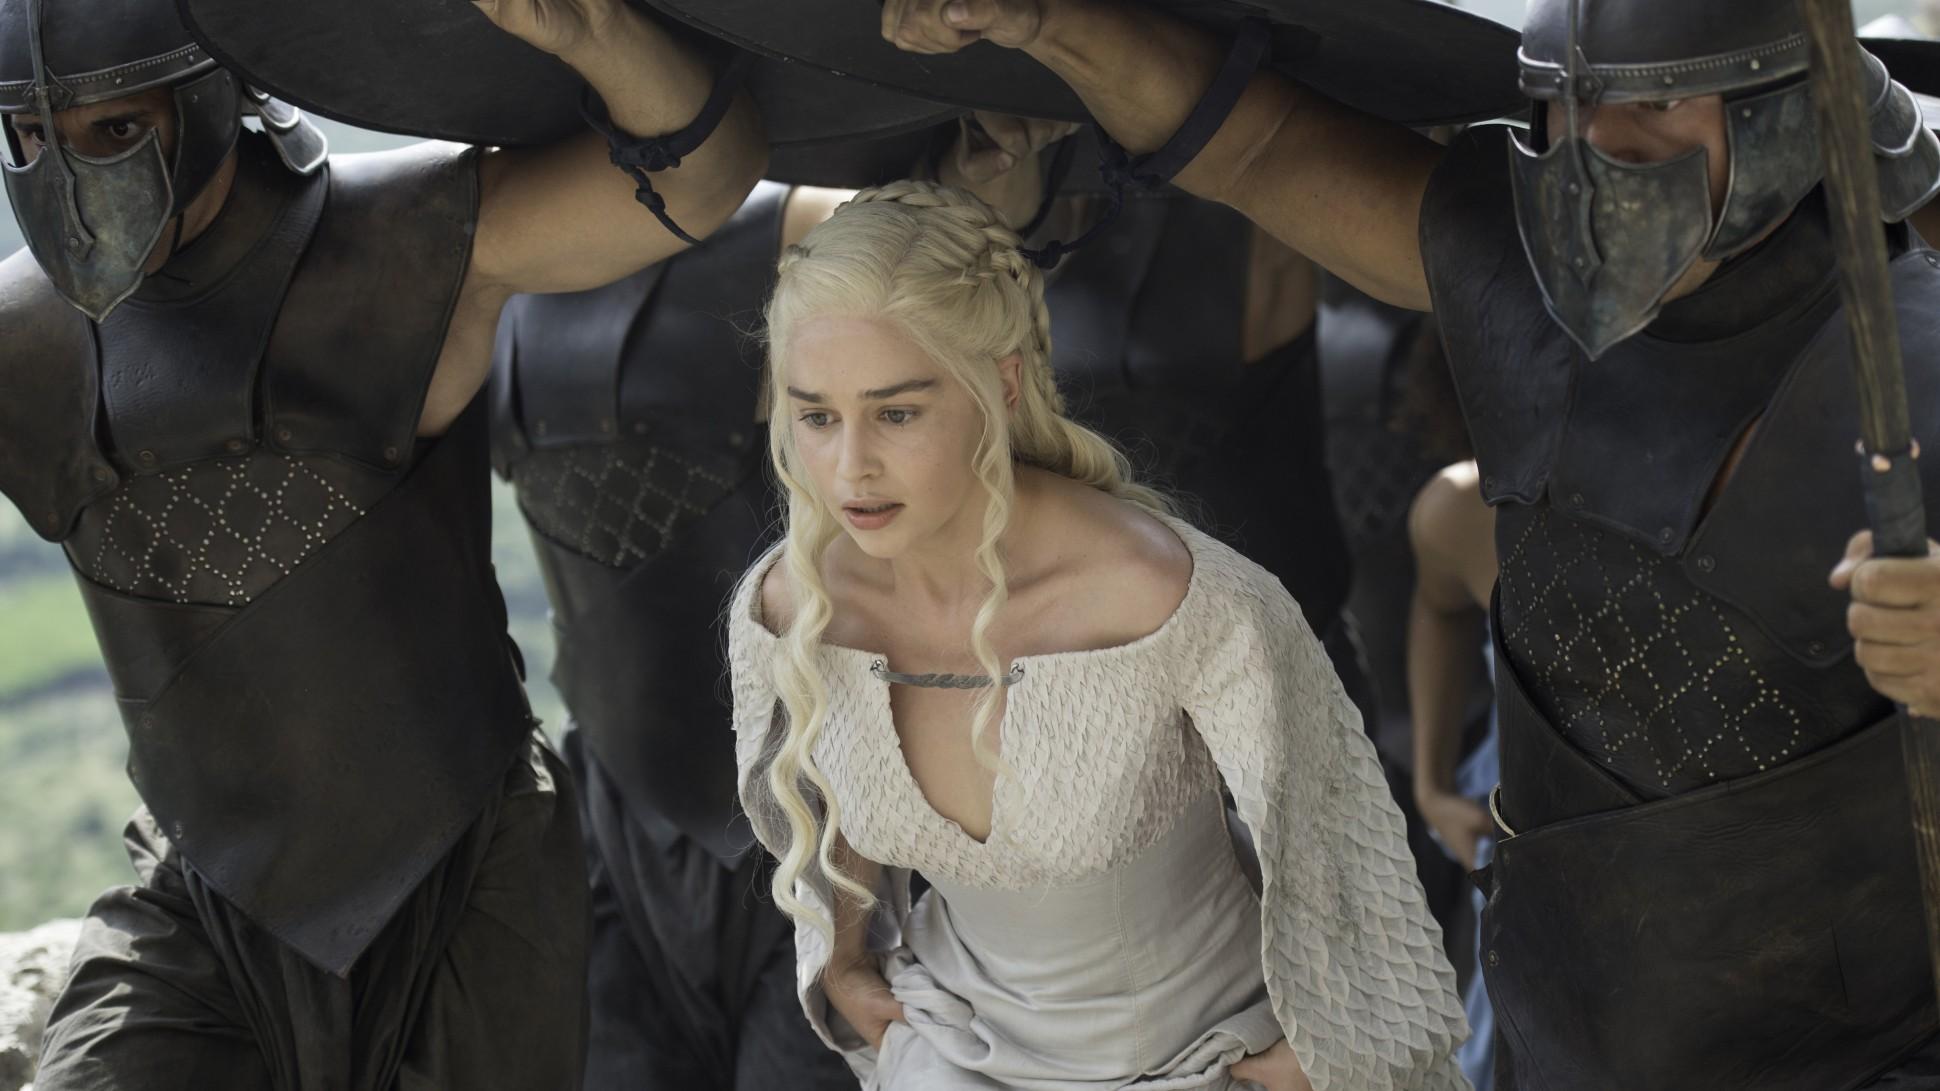 Game of Thrones season 7 Promo 2